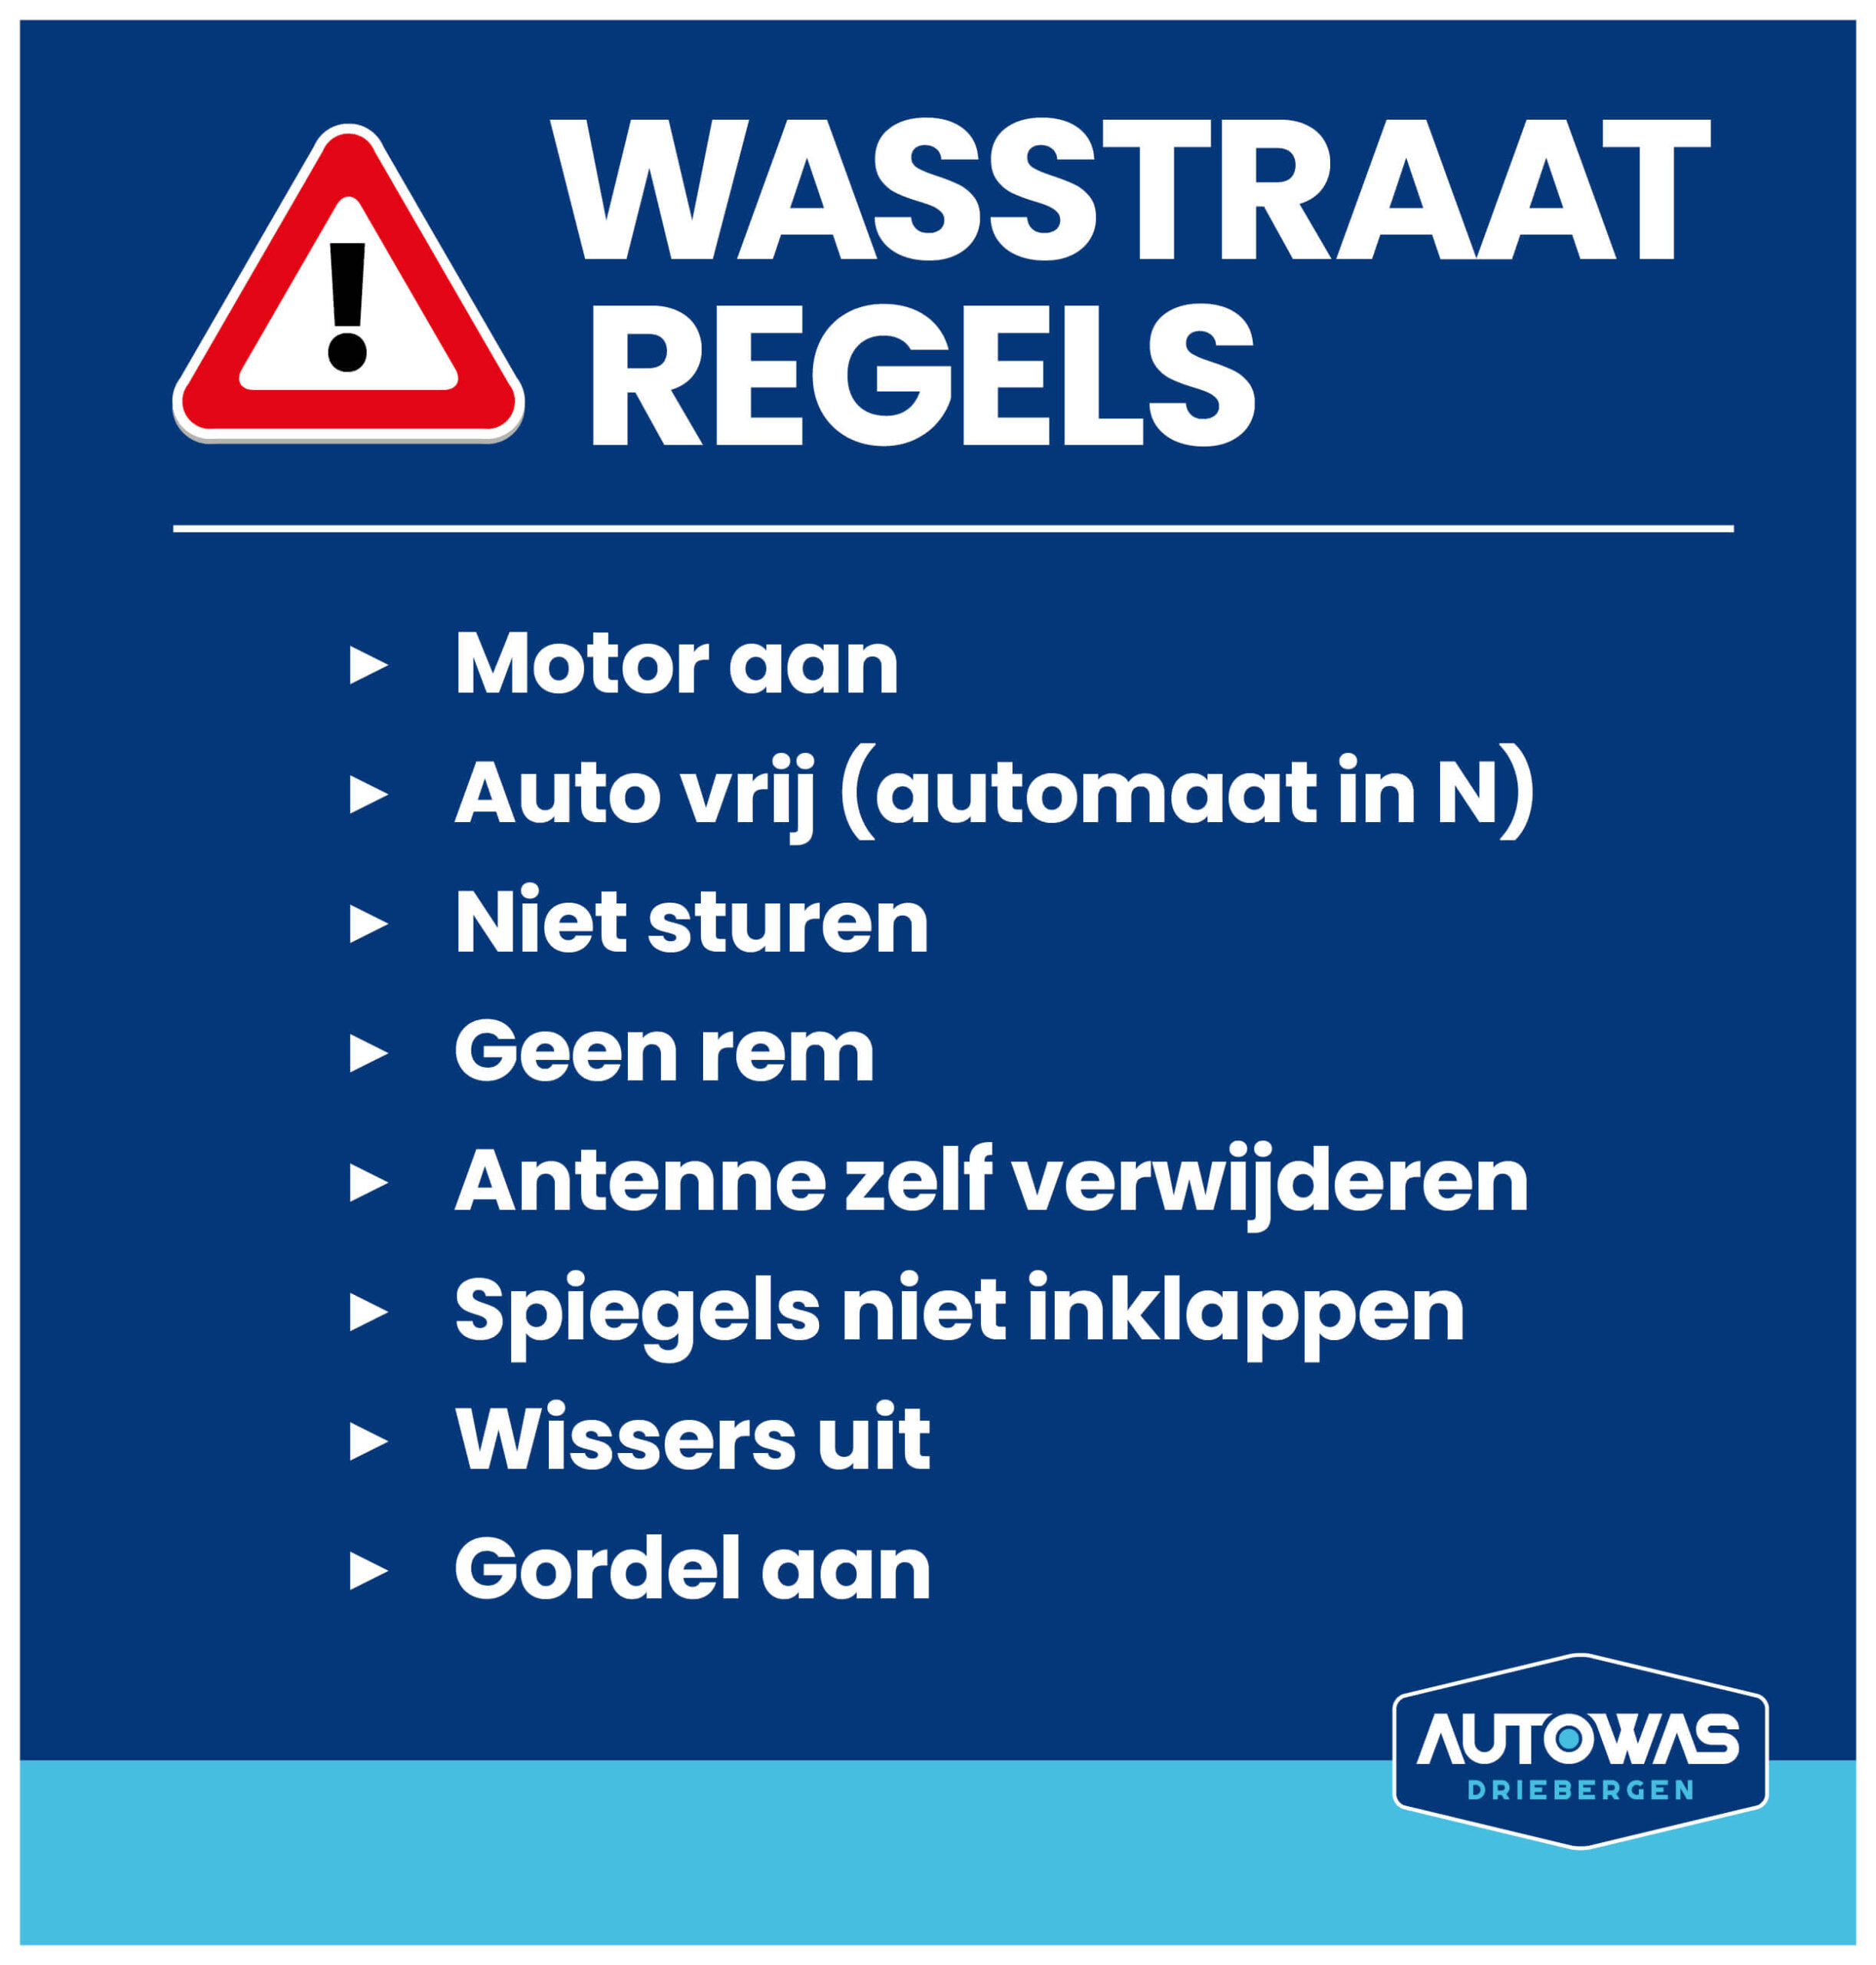 wasregels1